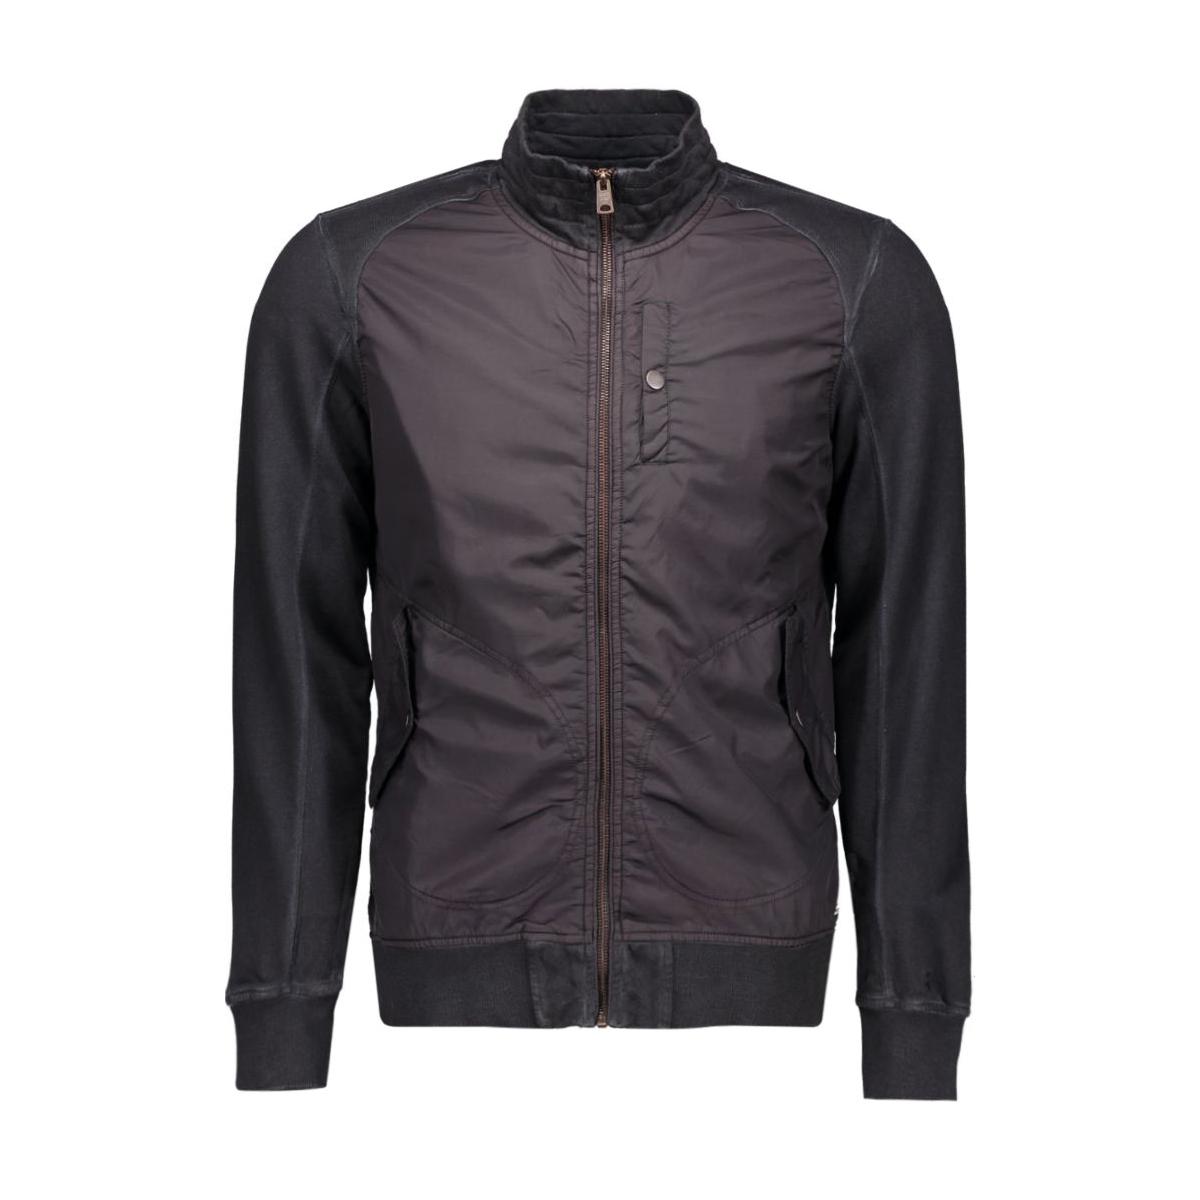 s61064 garcia vest 337 shade